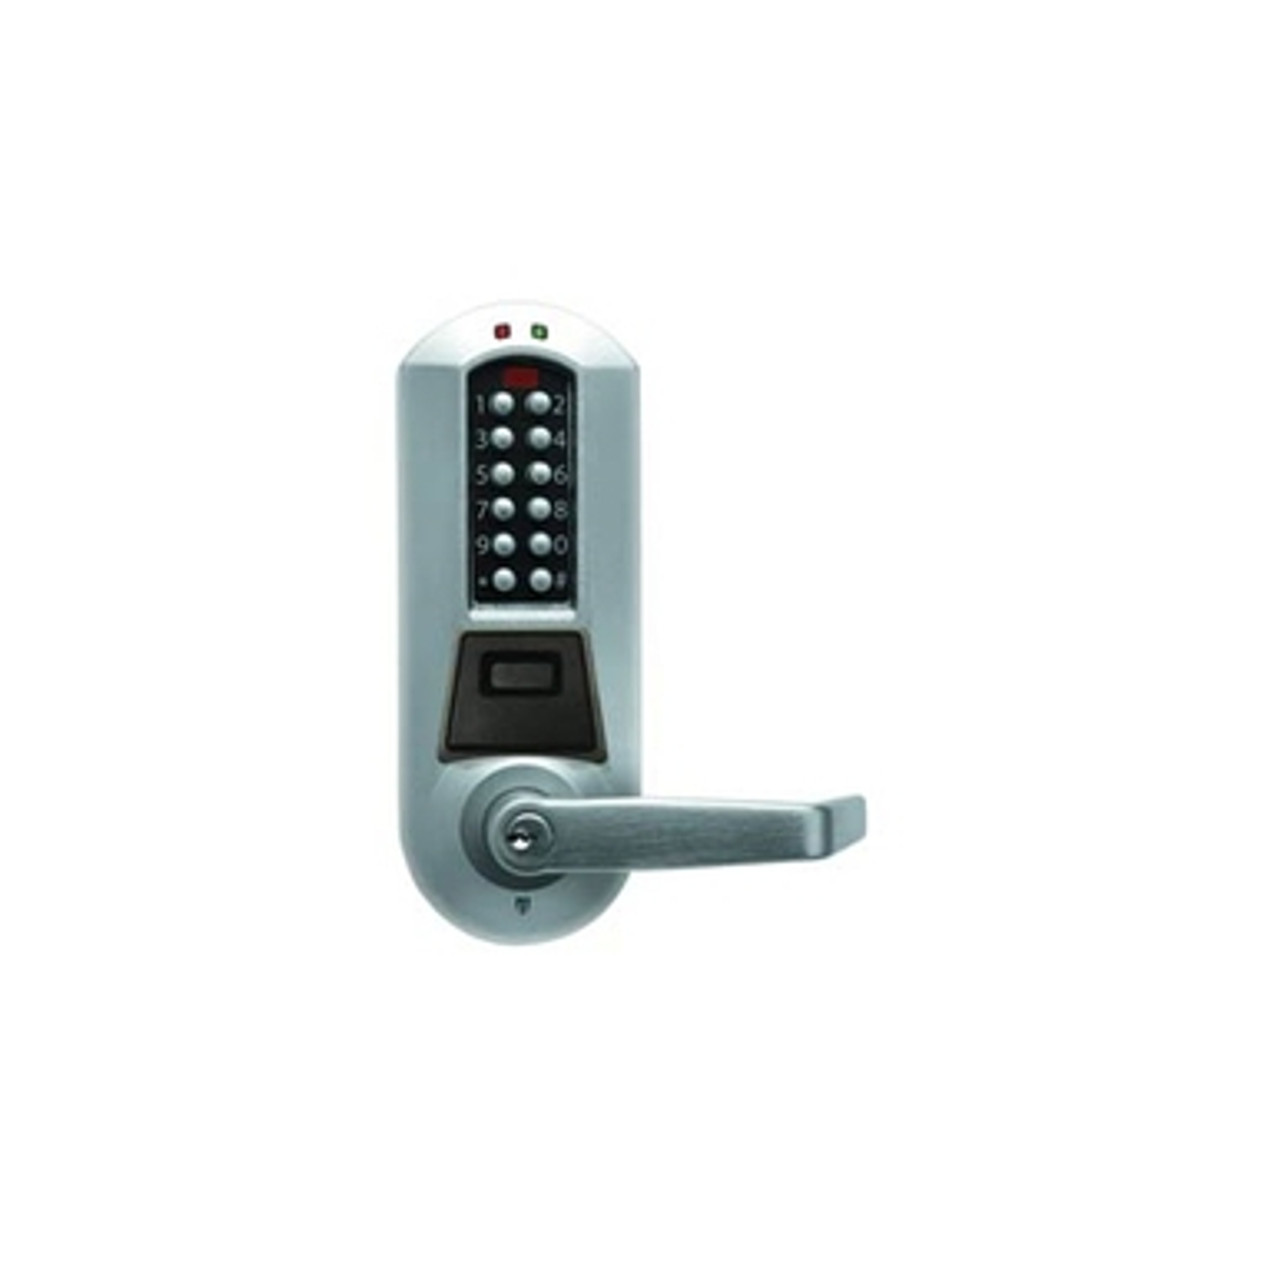 schlage electronic locks. Kaba E-Plex E5700 Series E5710XSWL-626-41 Exit Trim Schlage C Lever Electronic Lock Locks O